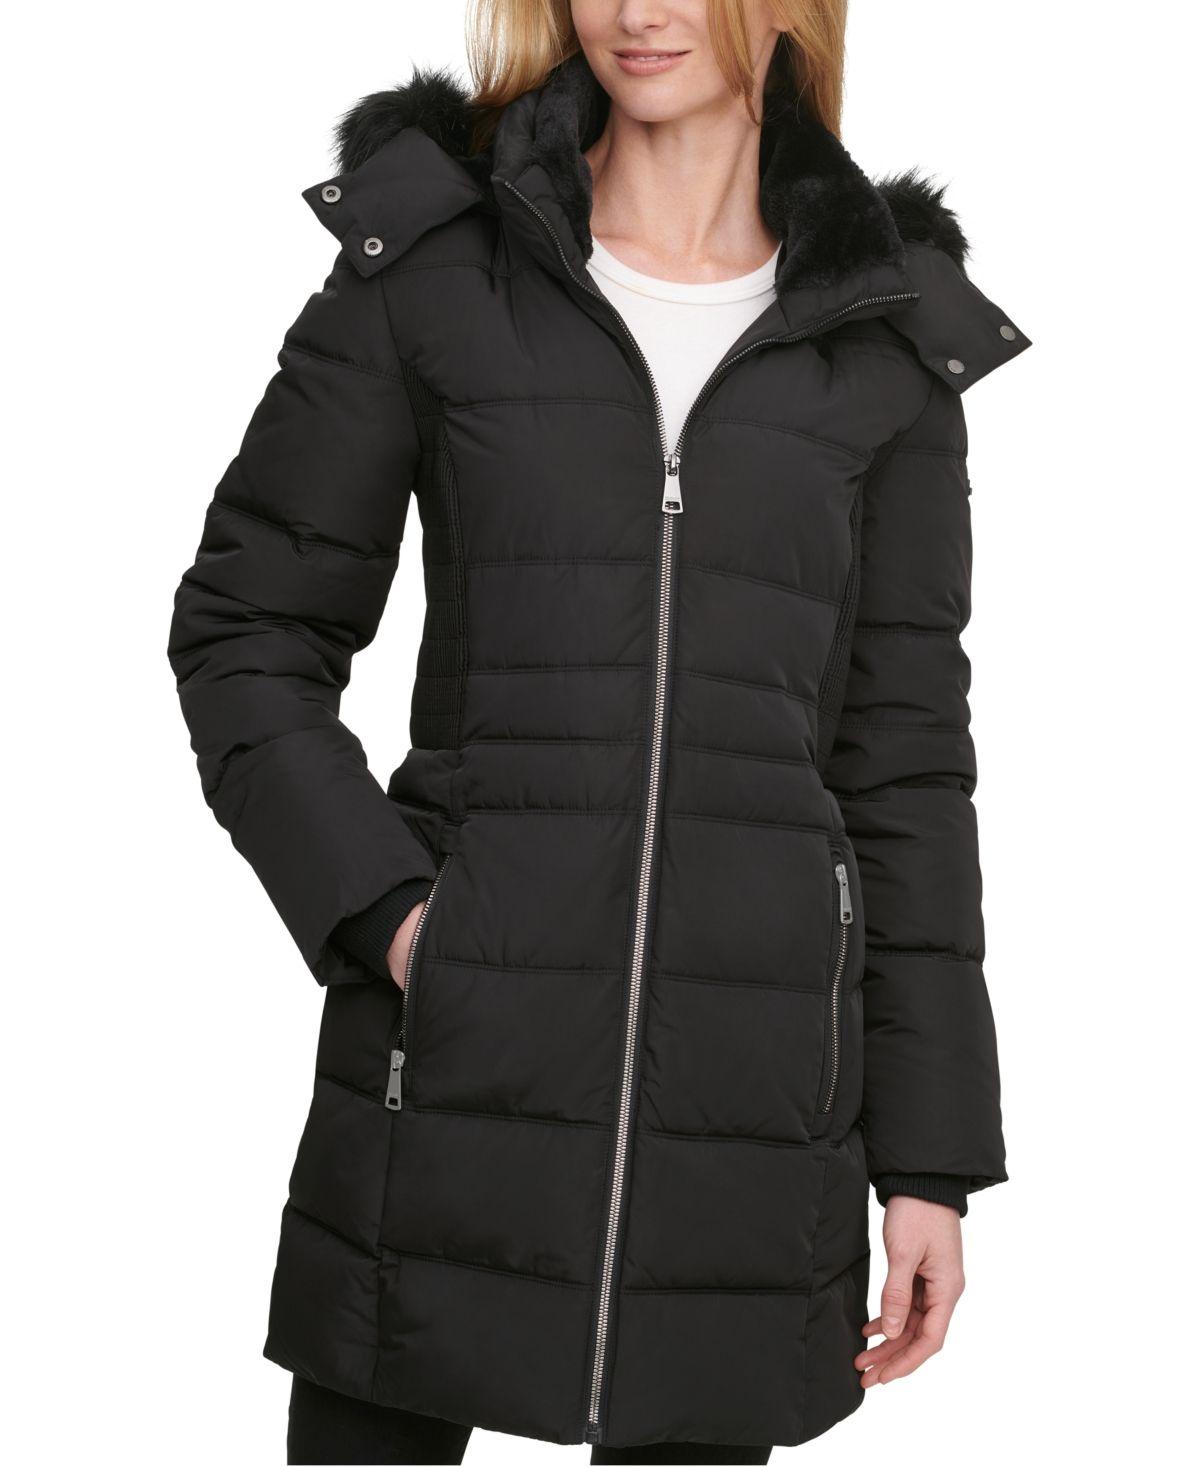 Dkny Faux Fur Trim Hooded Puffer Coat Created For Macy S Reviews Coats Women Macy S Puffer Coat Fur Trim Coats For Women [ 1467 x 1200 Pixel ]